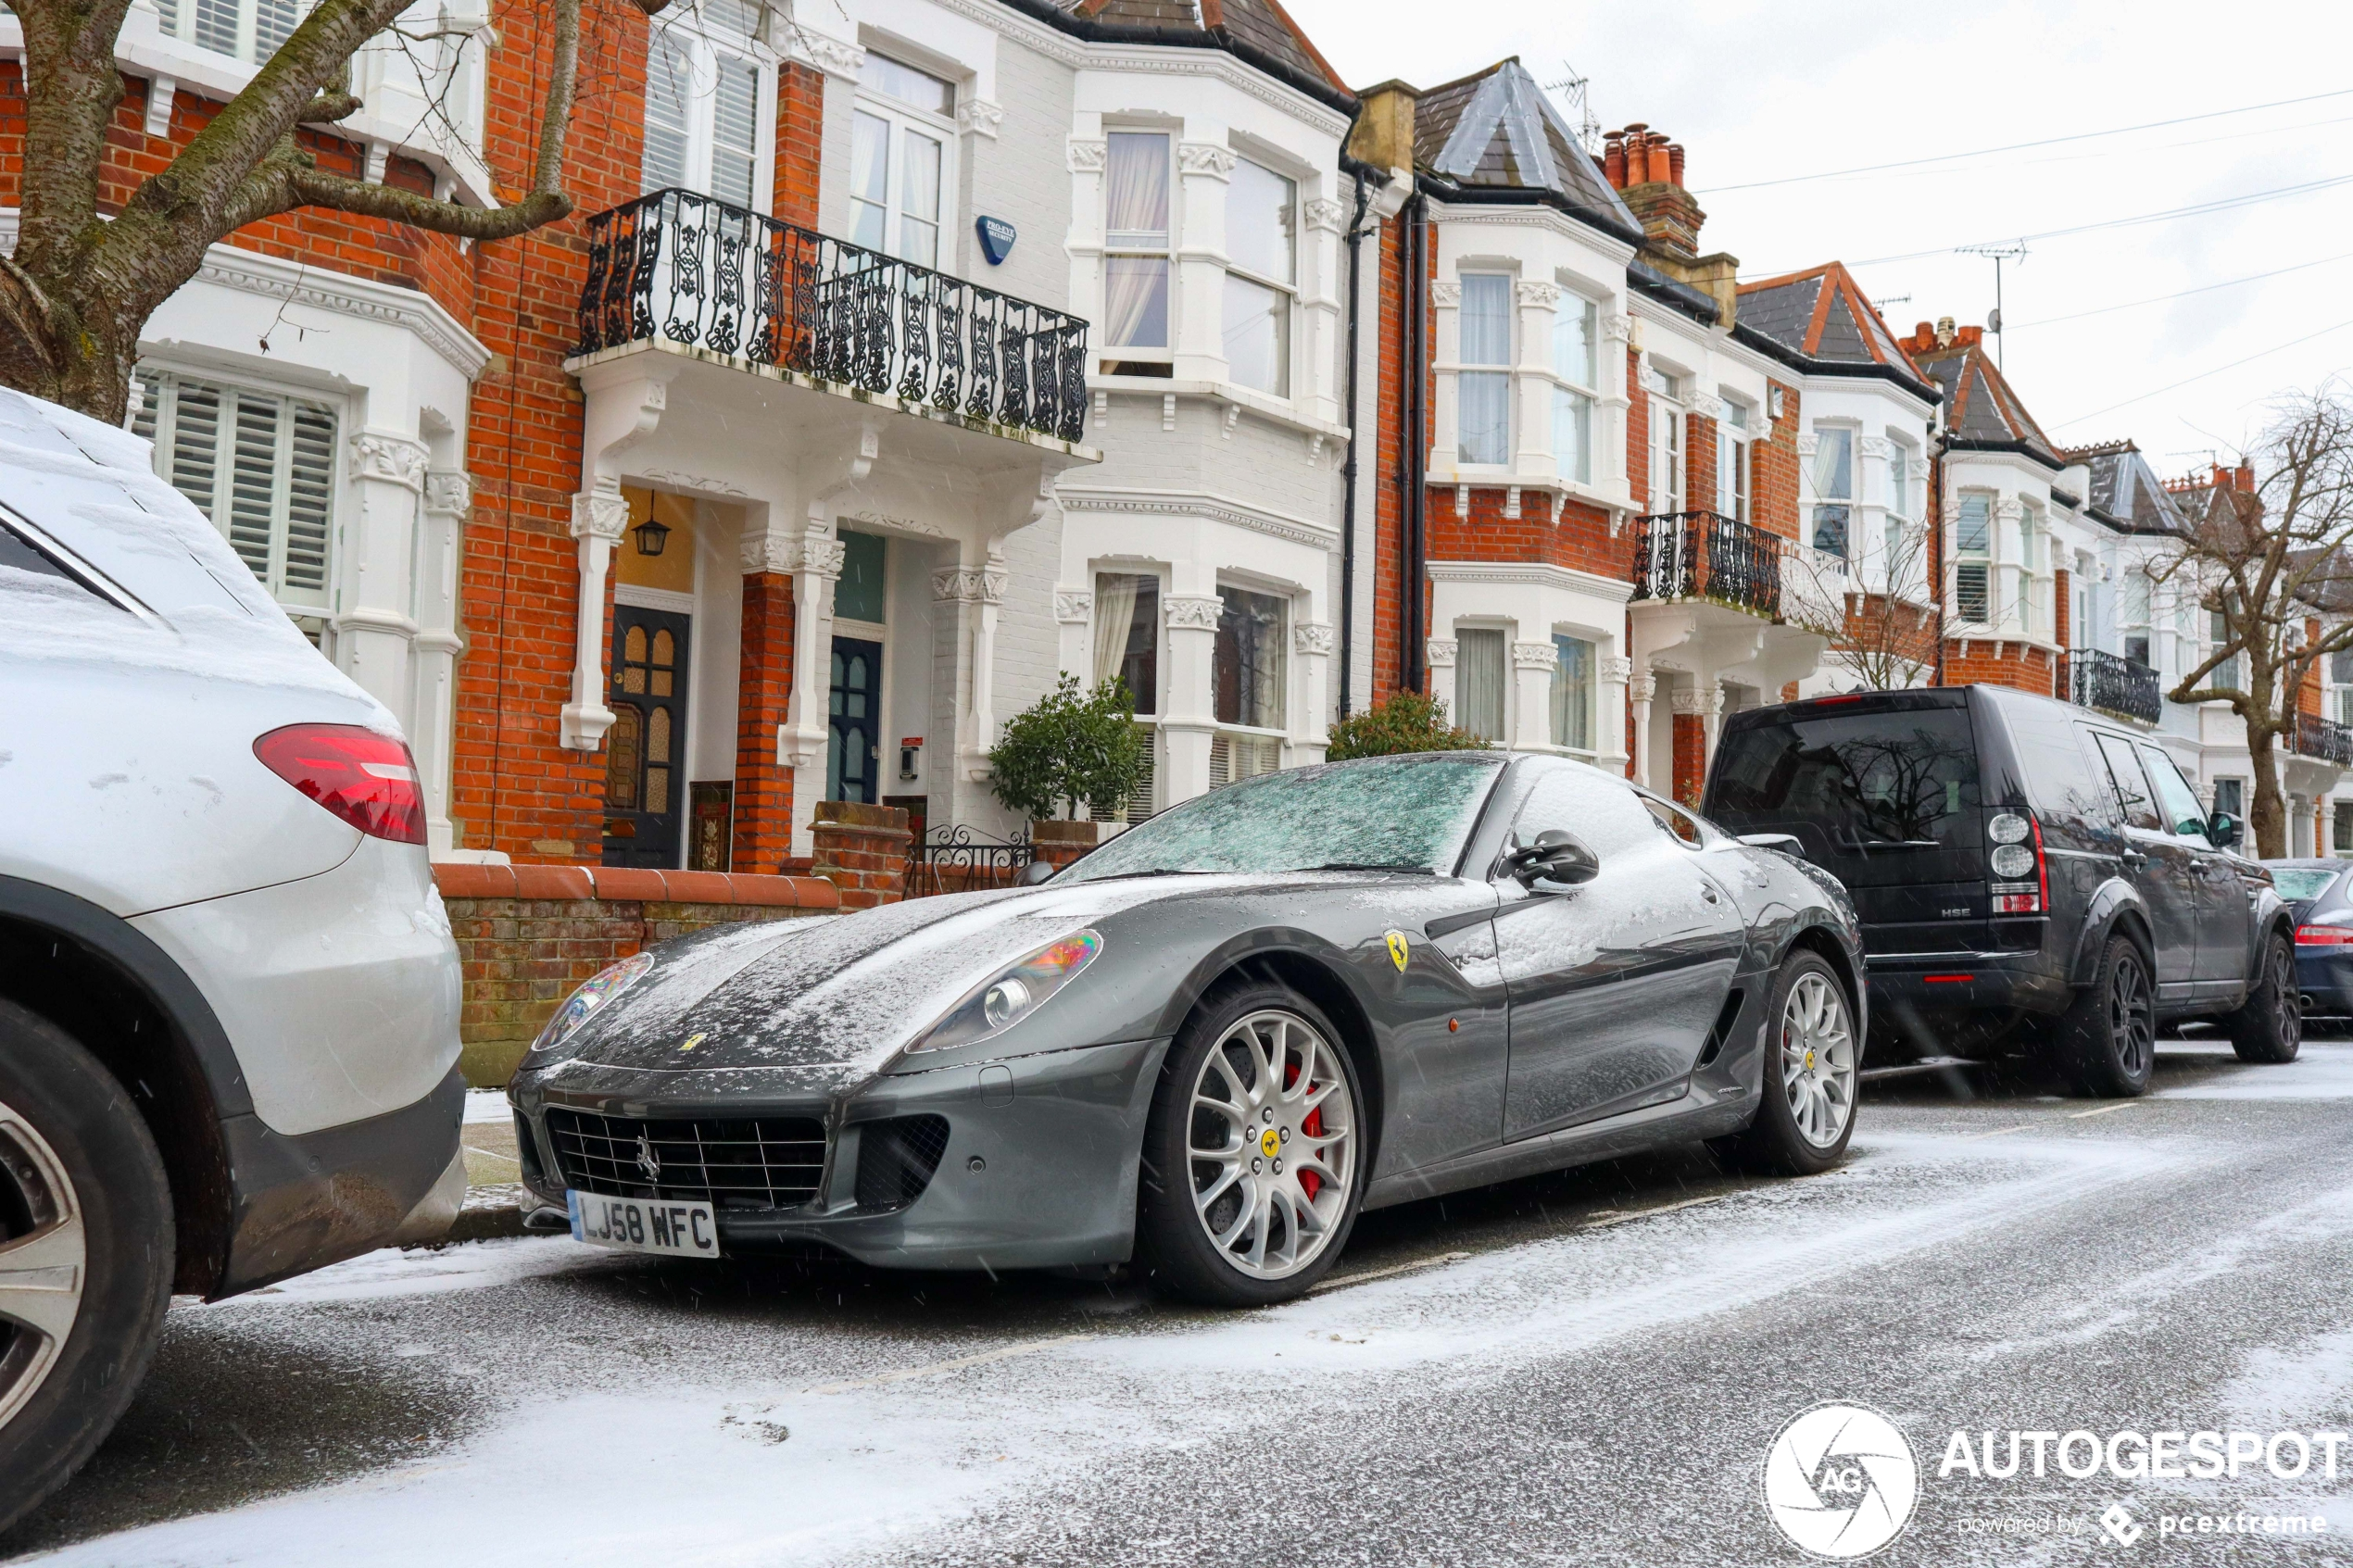 Supercars in Londen staan ook even stil